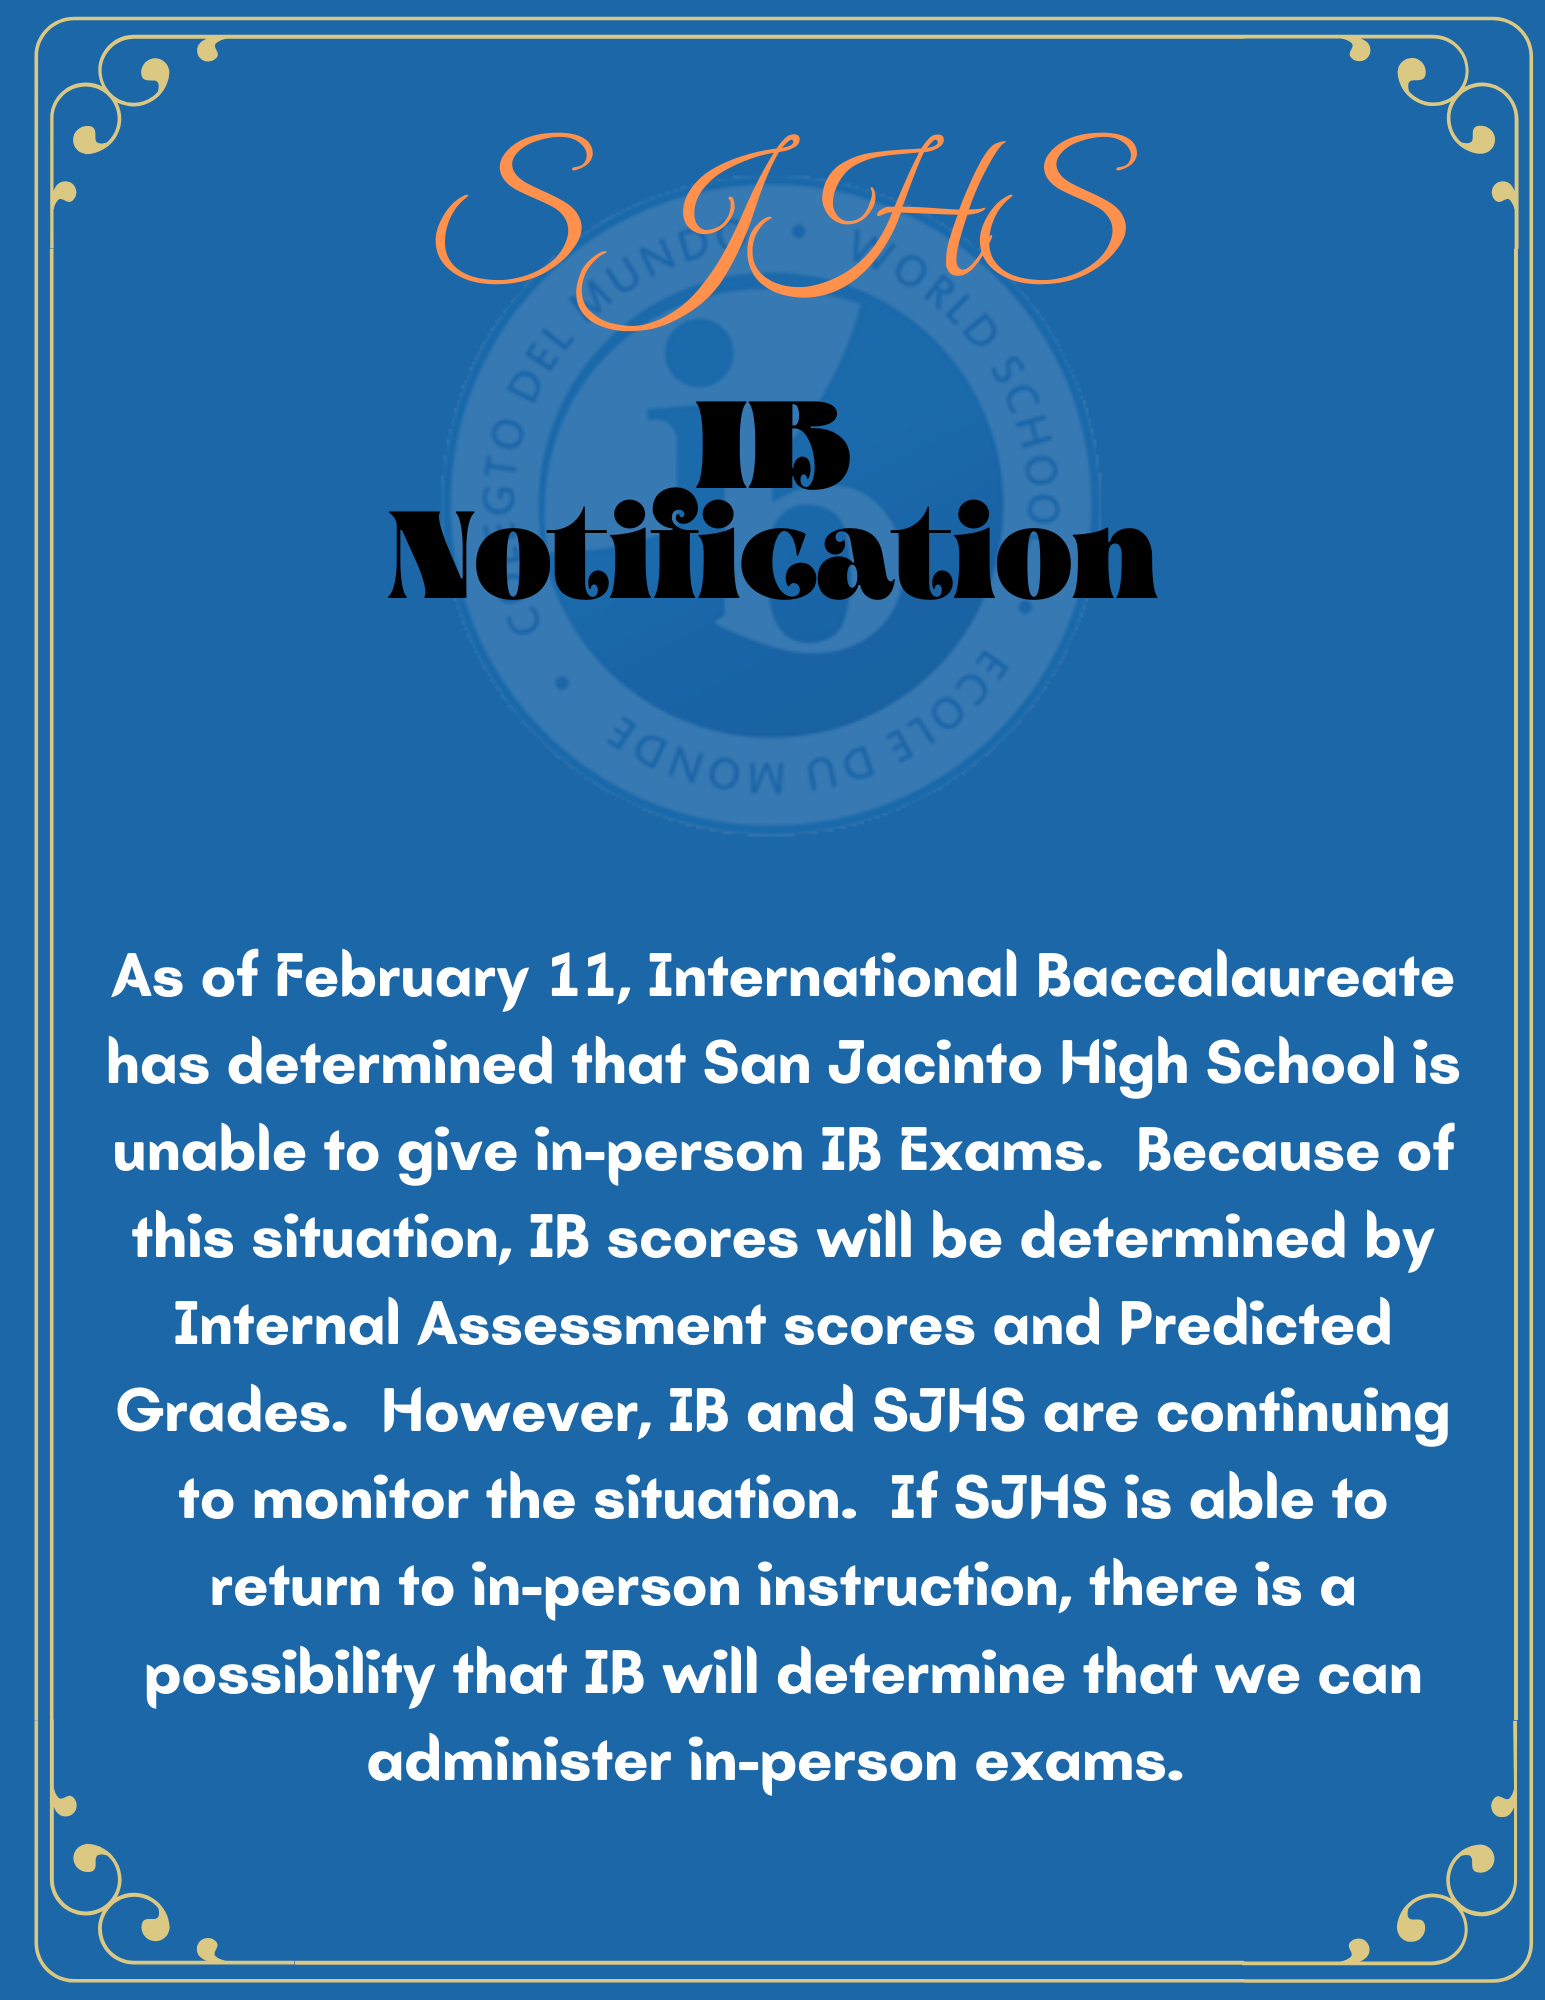 IB Notification